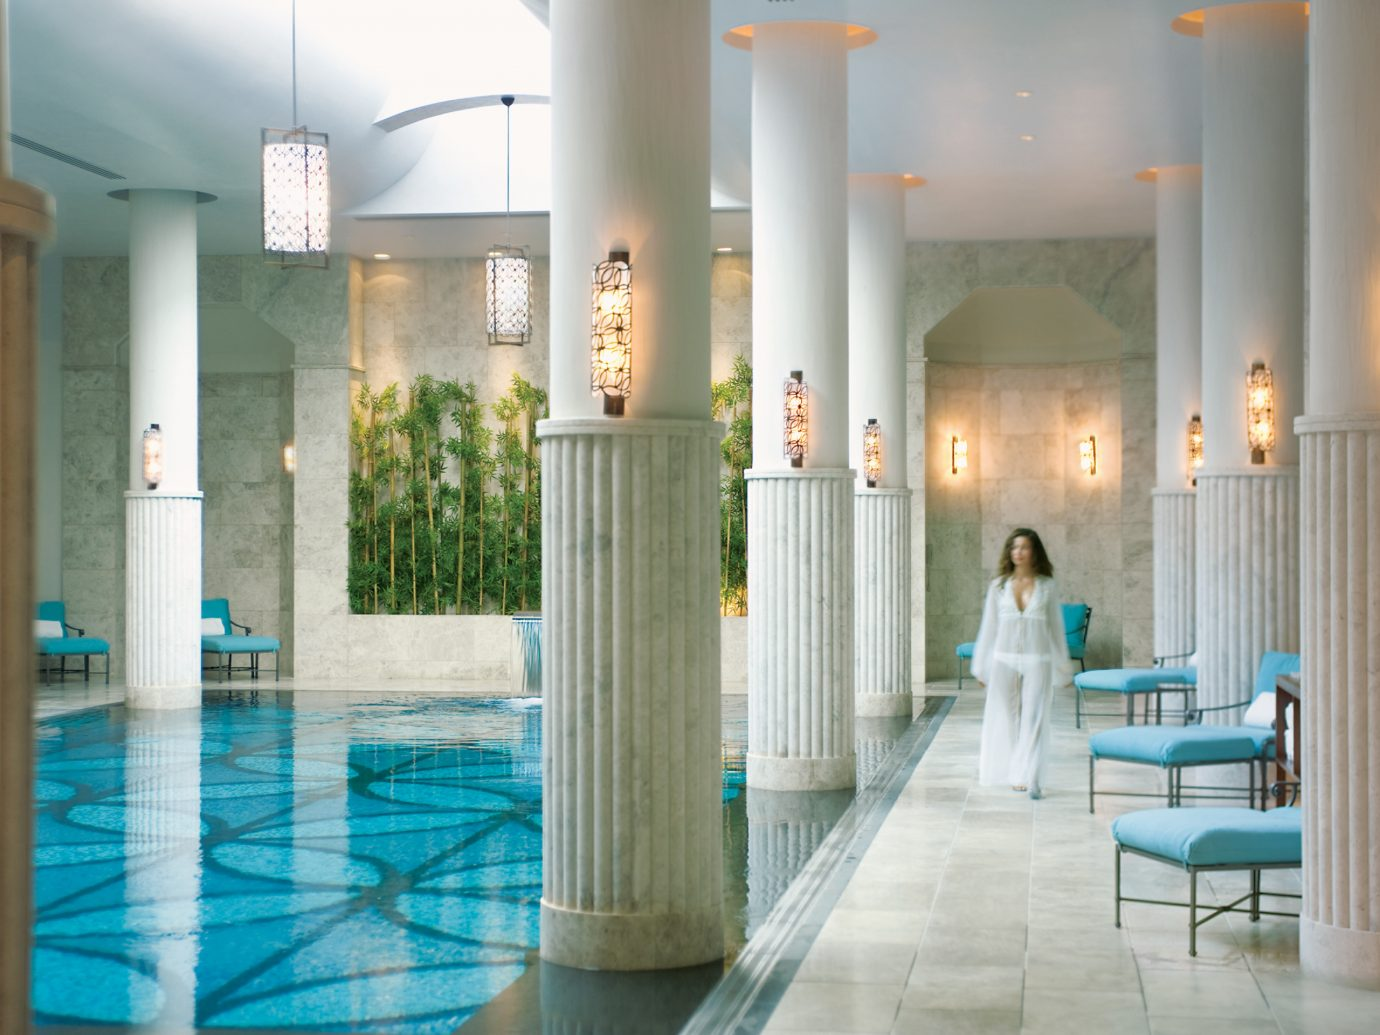 Elegant Hip Living Lounge Luxury Modern Pool Trip Ideas floor indoor swimming pool Lobby estate interior design mansion area furniture